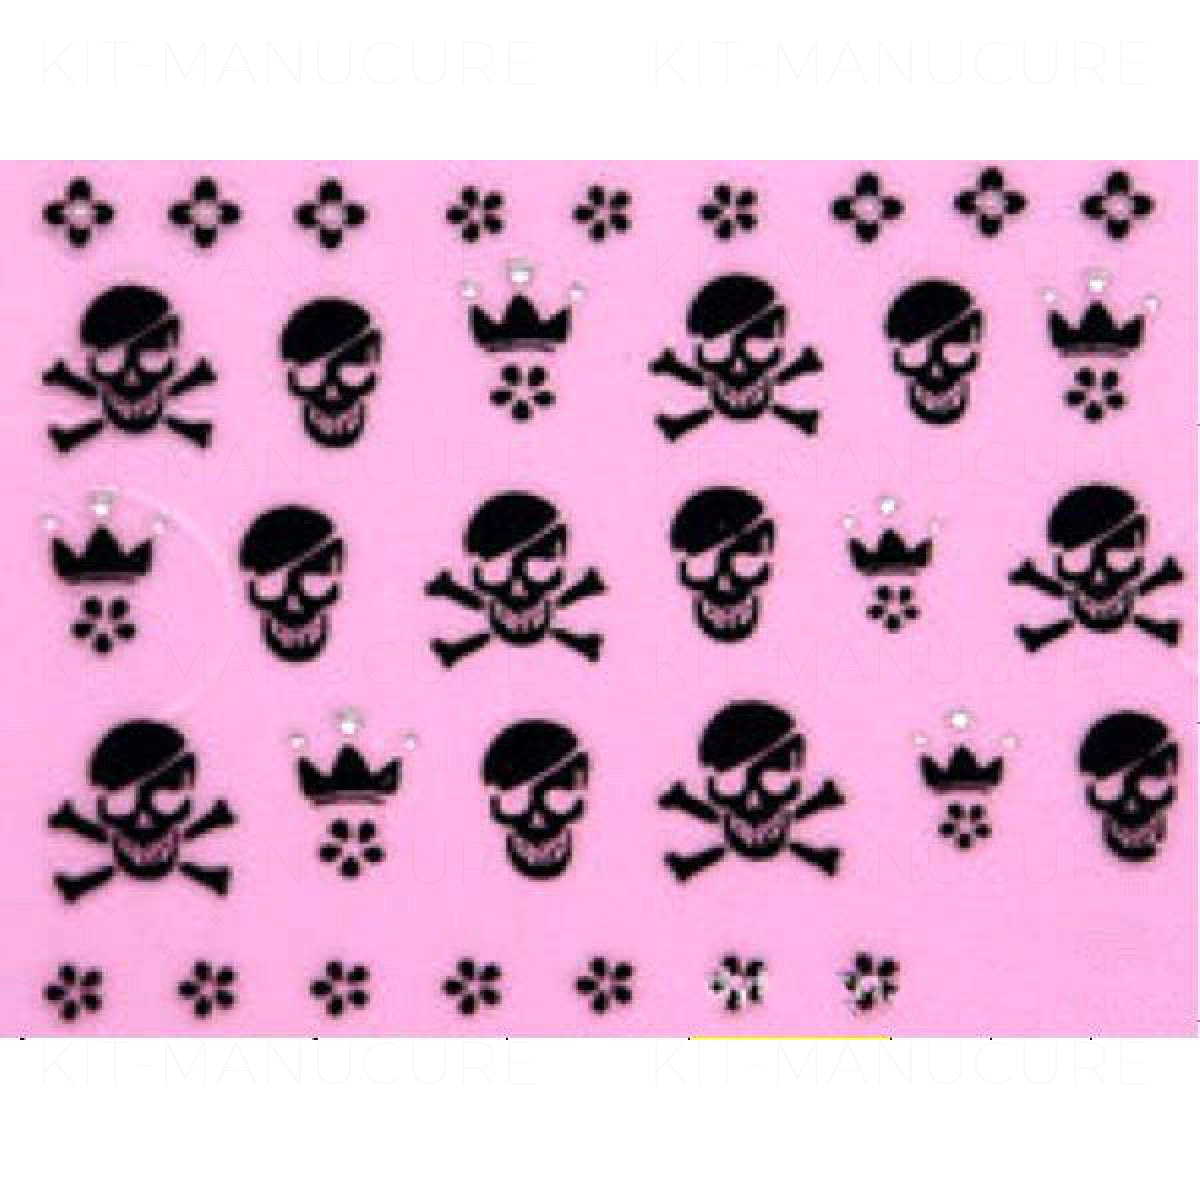 https://www.kit-manucure.com/564-thickbox_default/stickers-tête-de-mort-noir.jpg